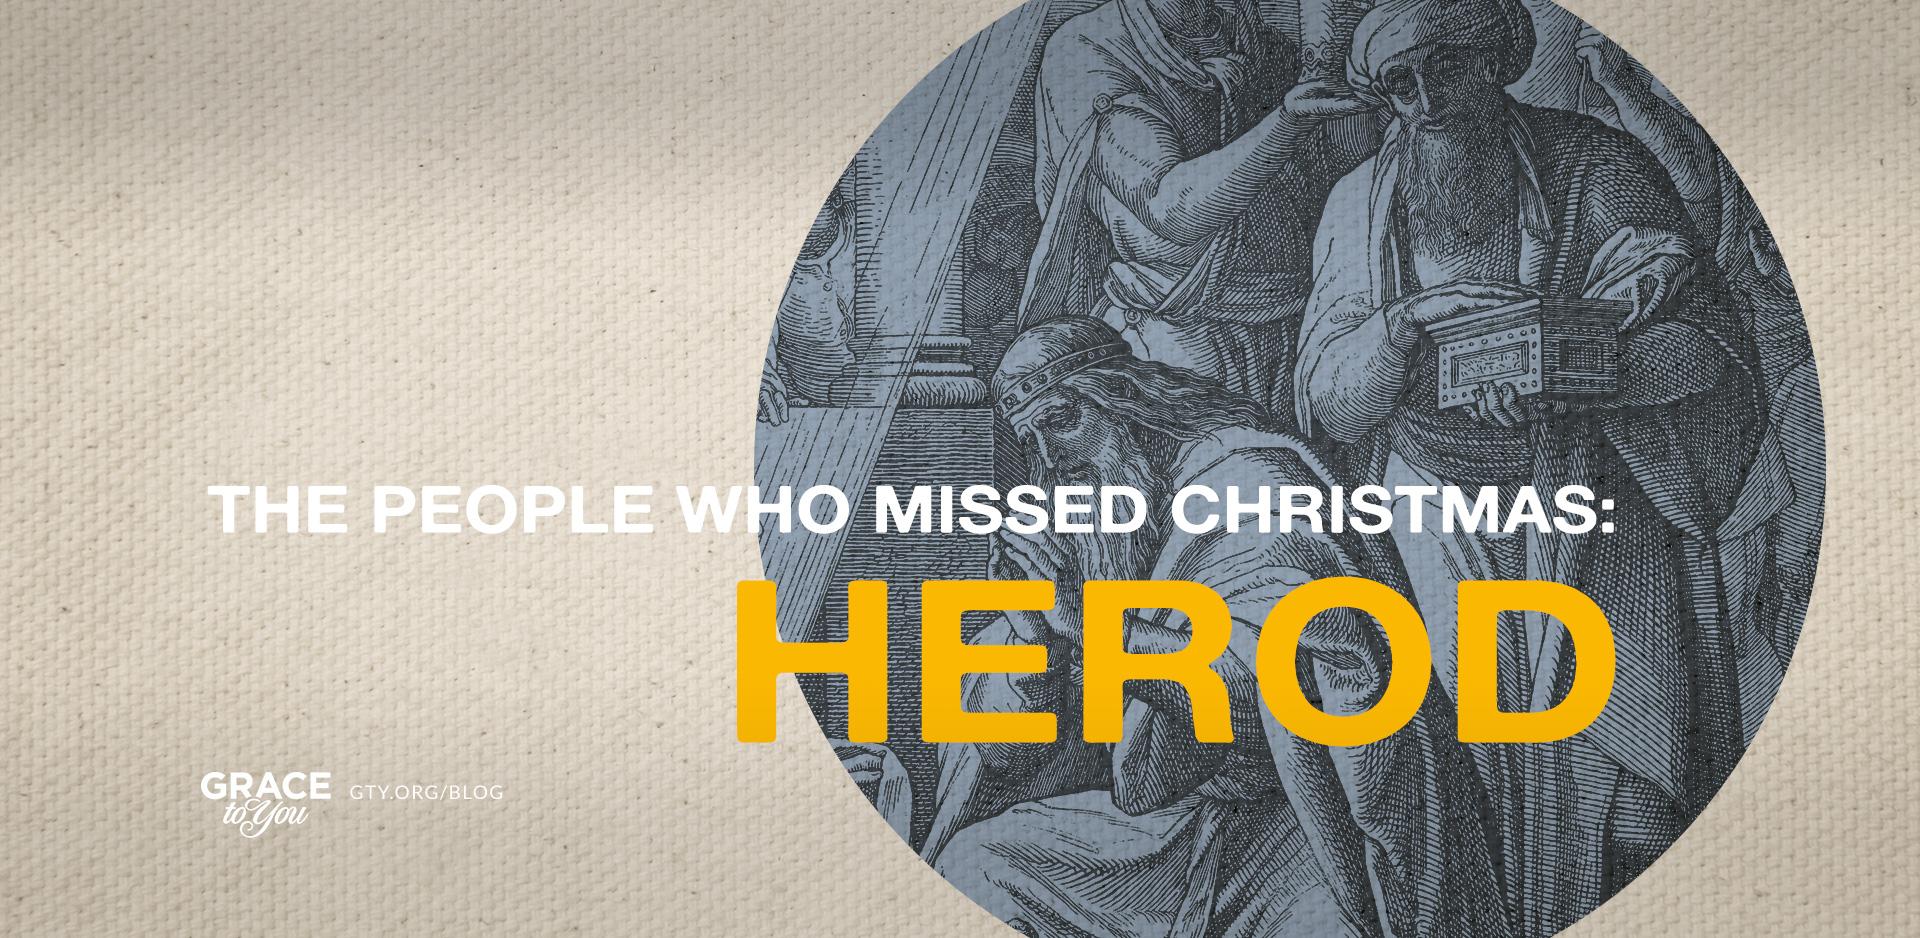 The People Who Missed Christmas: Herod